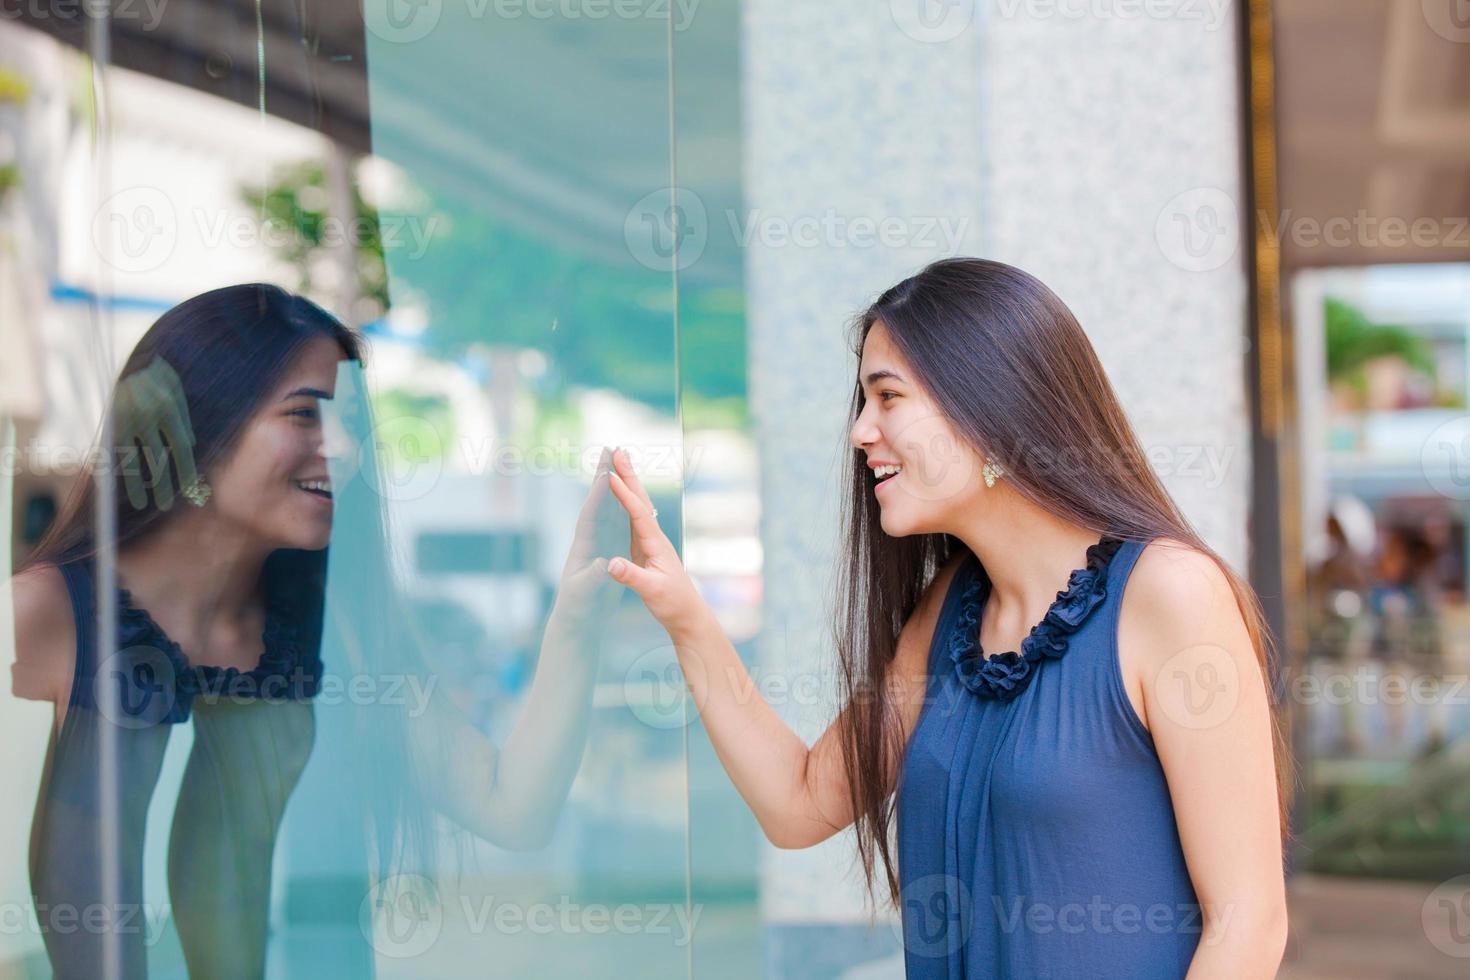 shopping ragazza finestra biracial teen in ambiente urbano in centro foto